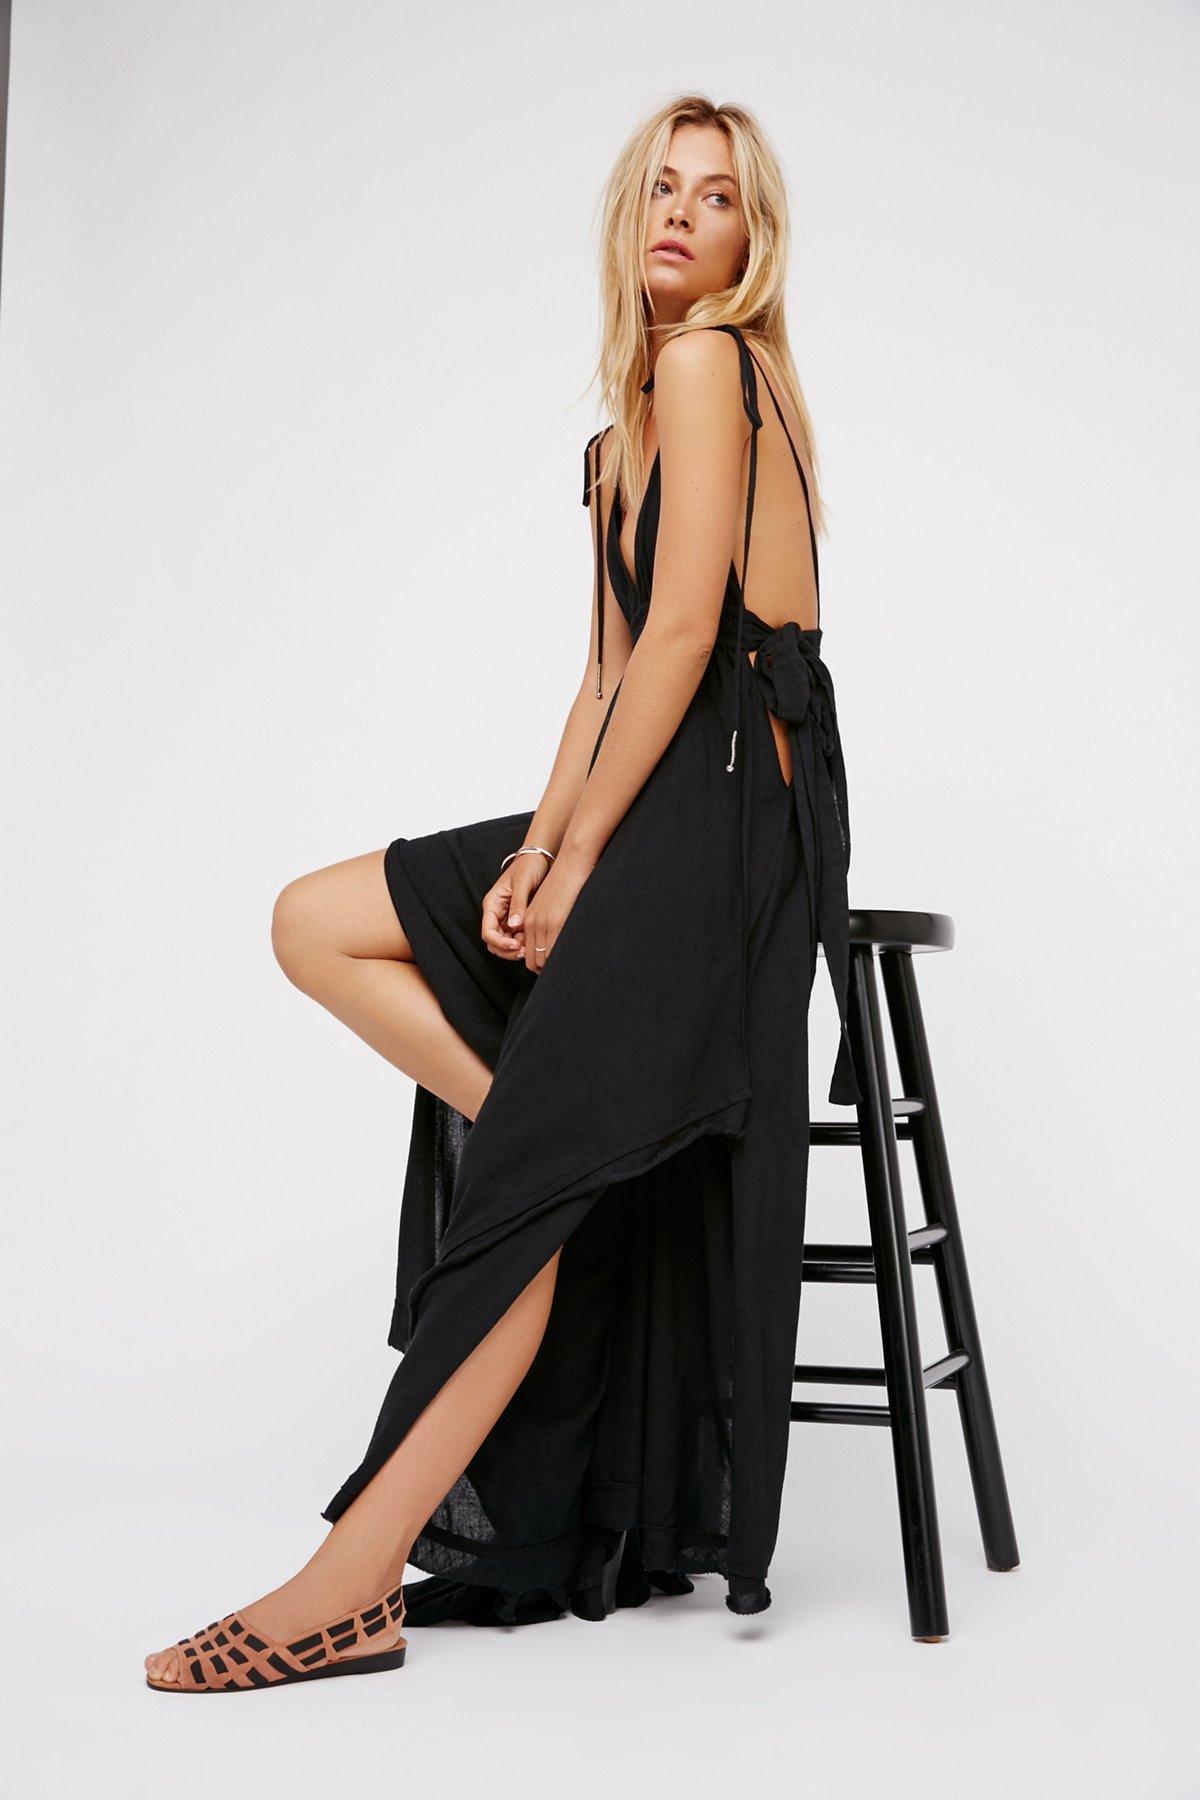 Tropical Heat长款连衣裙